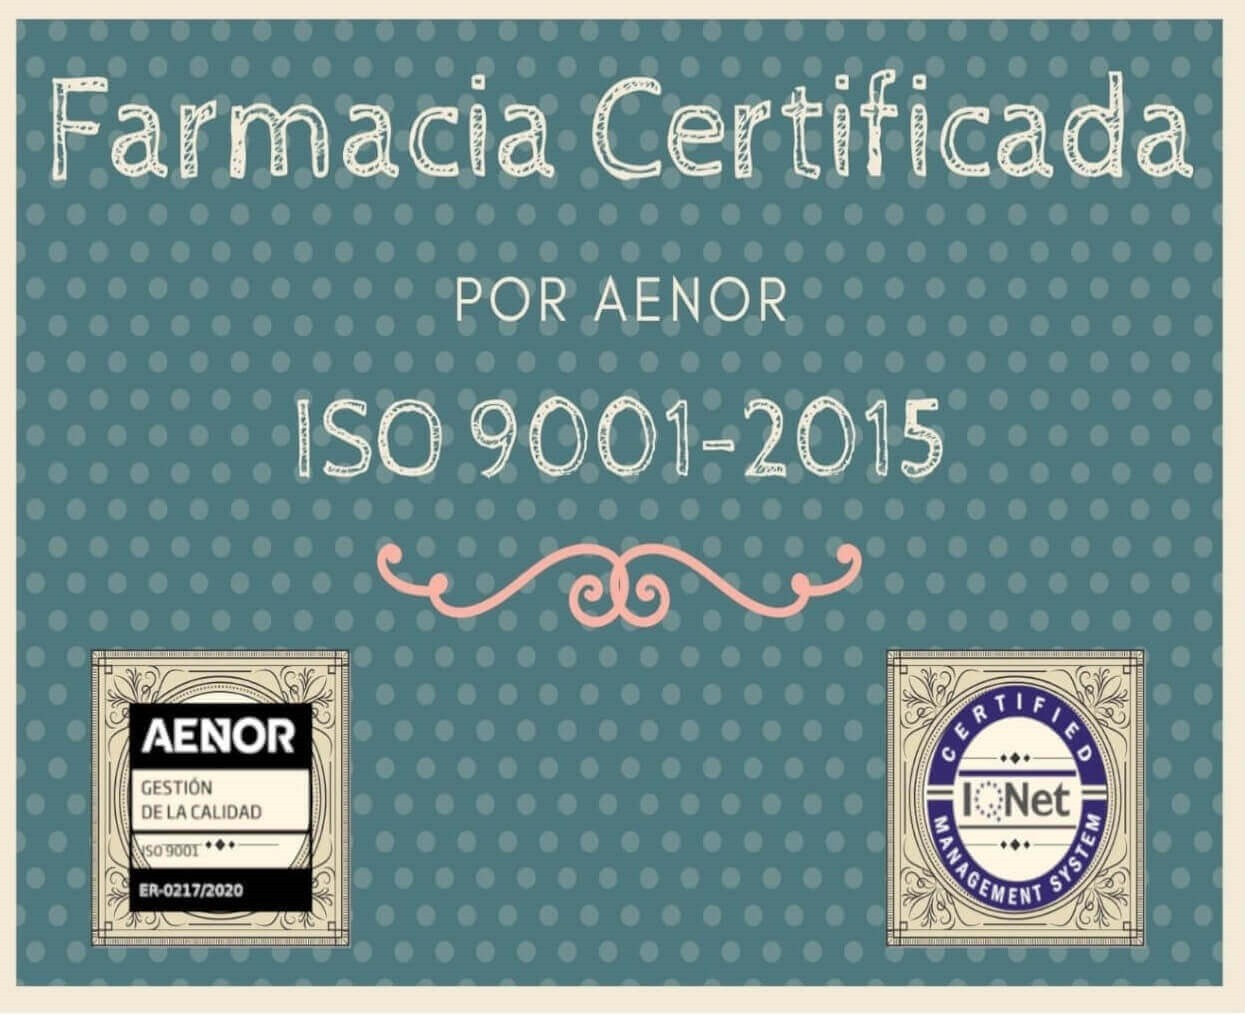 Bienvenidos a Blesa Farmacia-Tu farmacia certificada de Canarias